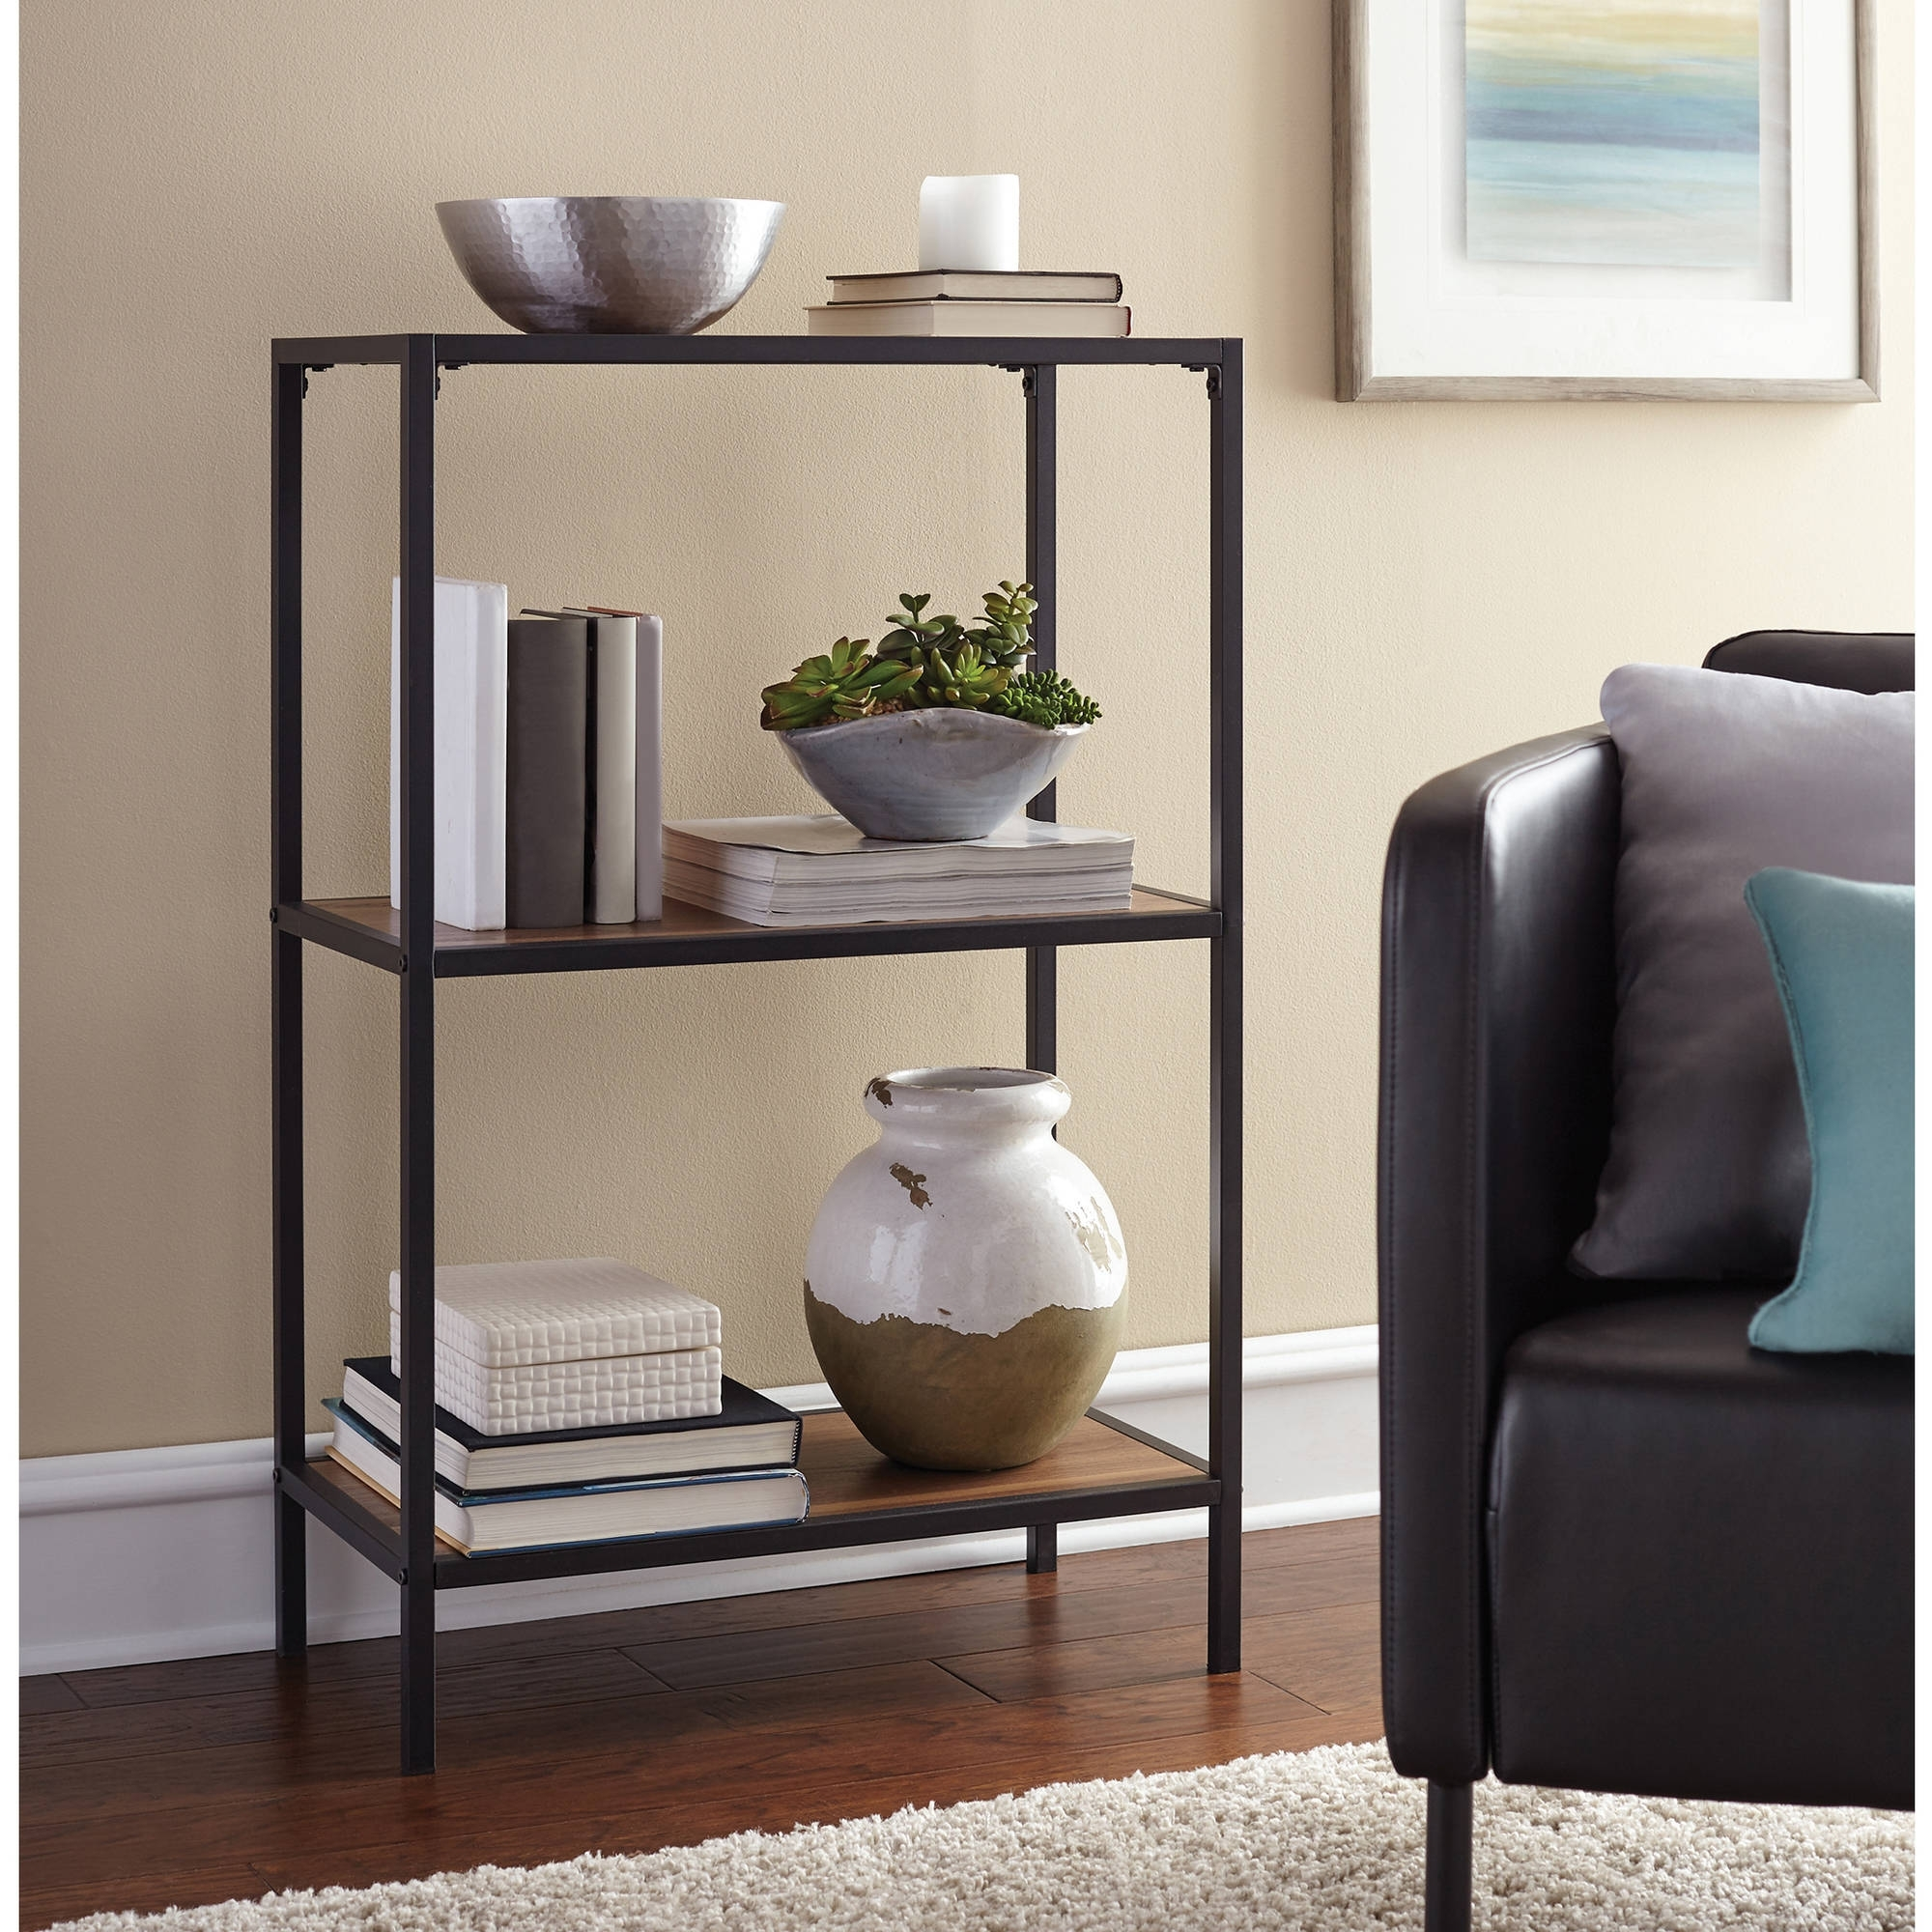 Mainstays Metro 3 Shelf Bookcase, Warm Ash Finish – Walmart Within Latest Walmart 3 Shelf Bookcases (View 8 of 15)